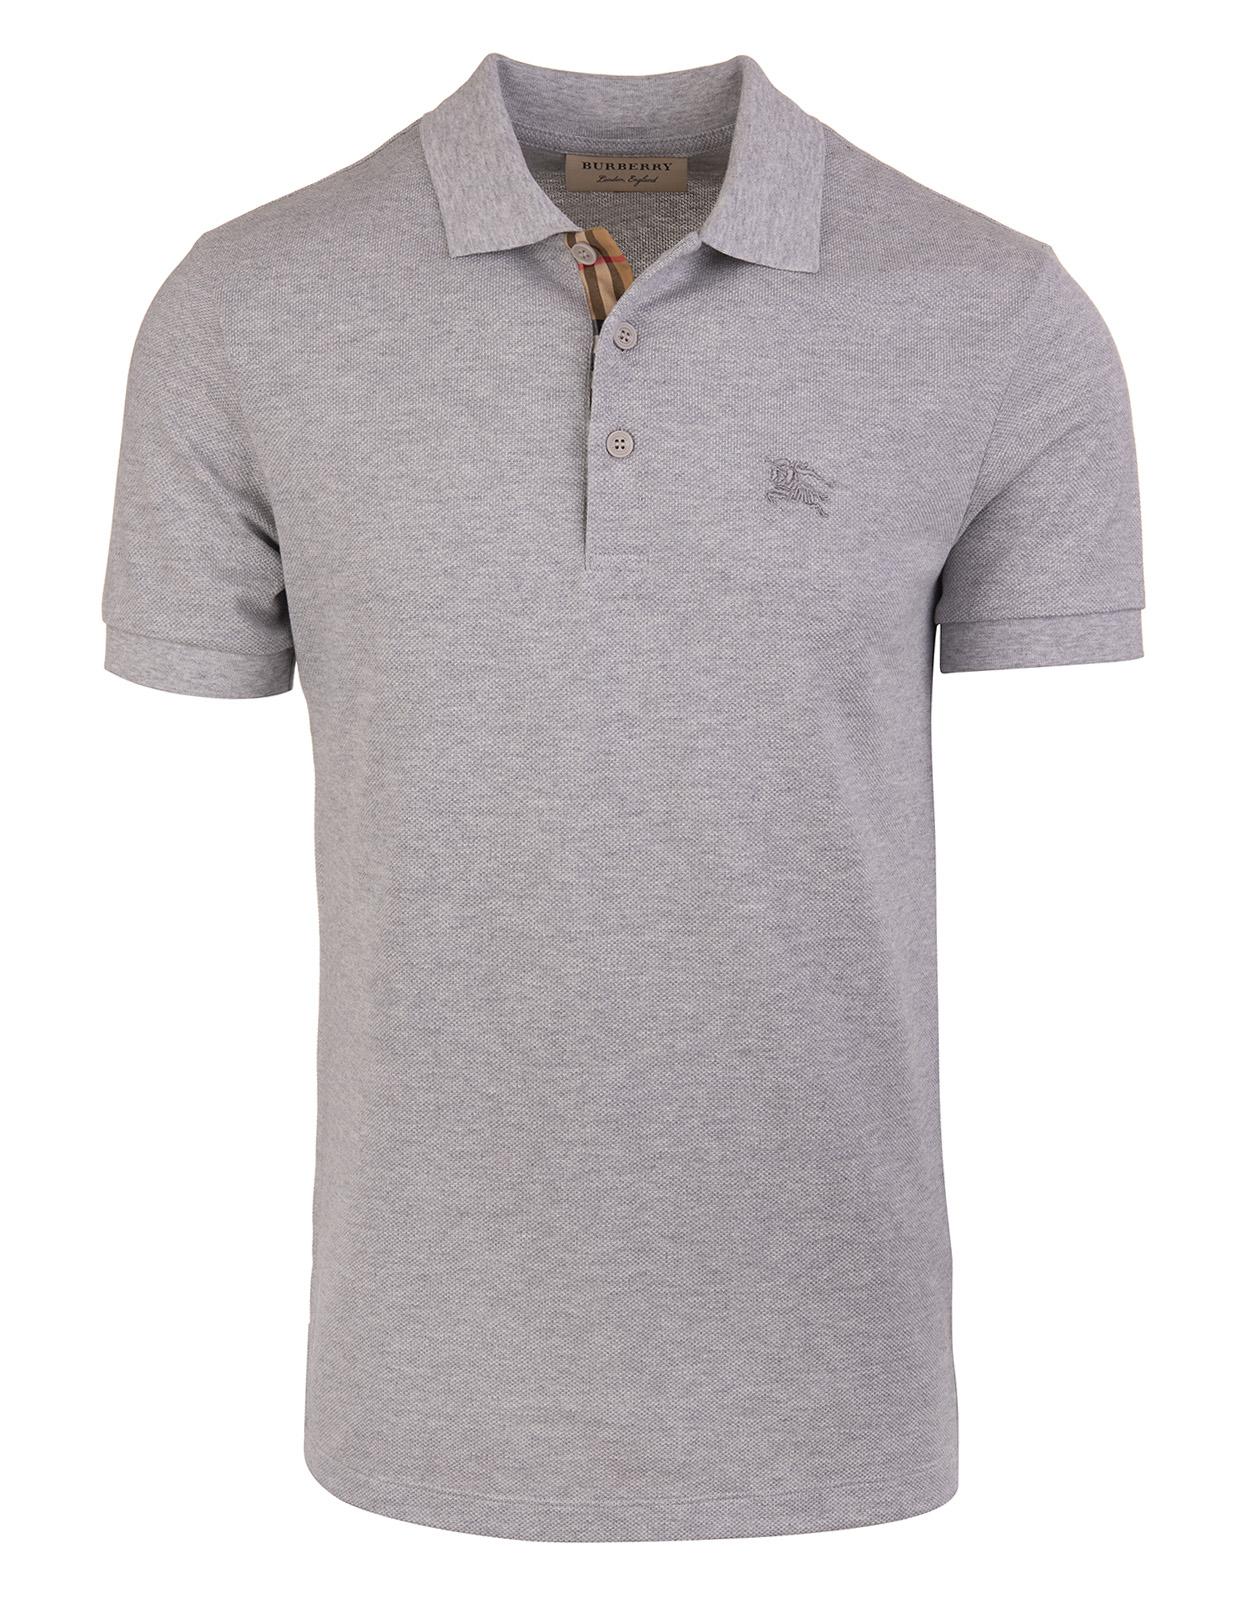 974ed34fb Grey Classic Polo Shirt With Tartan Placket - BURBERRY - Russocapri